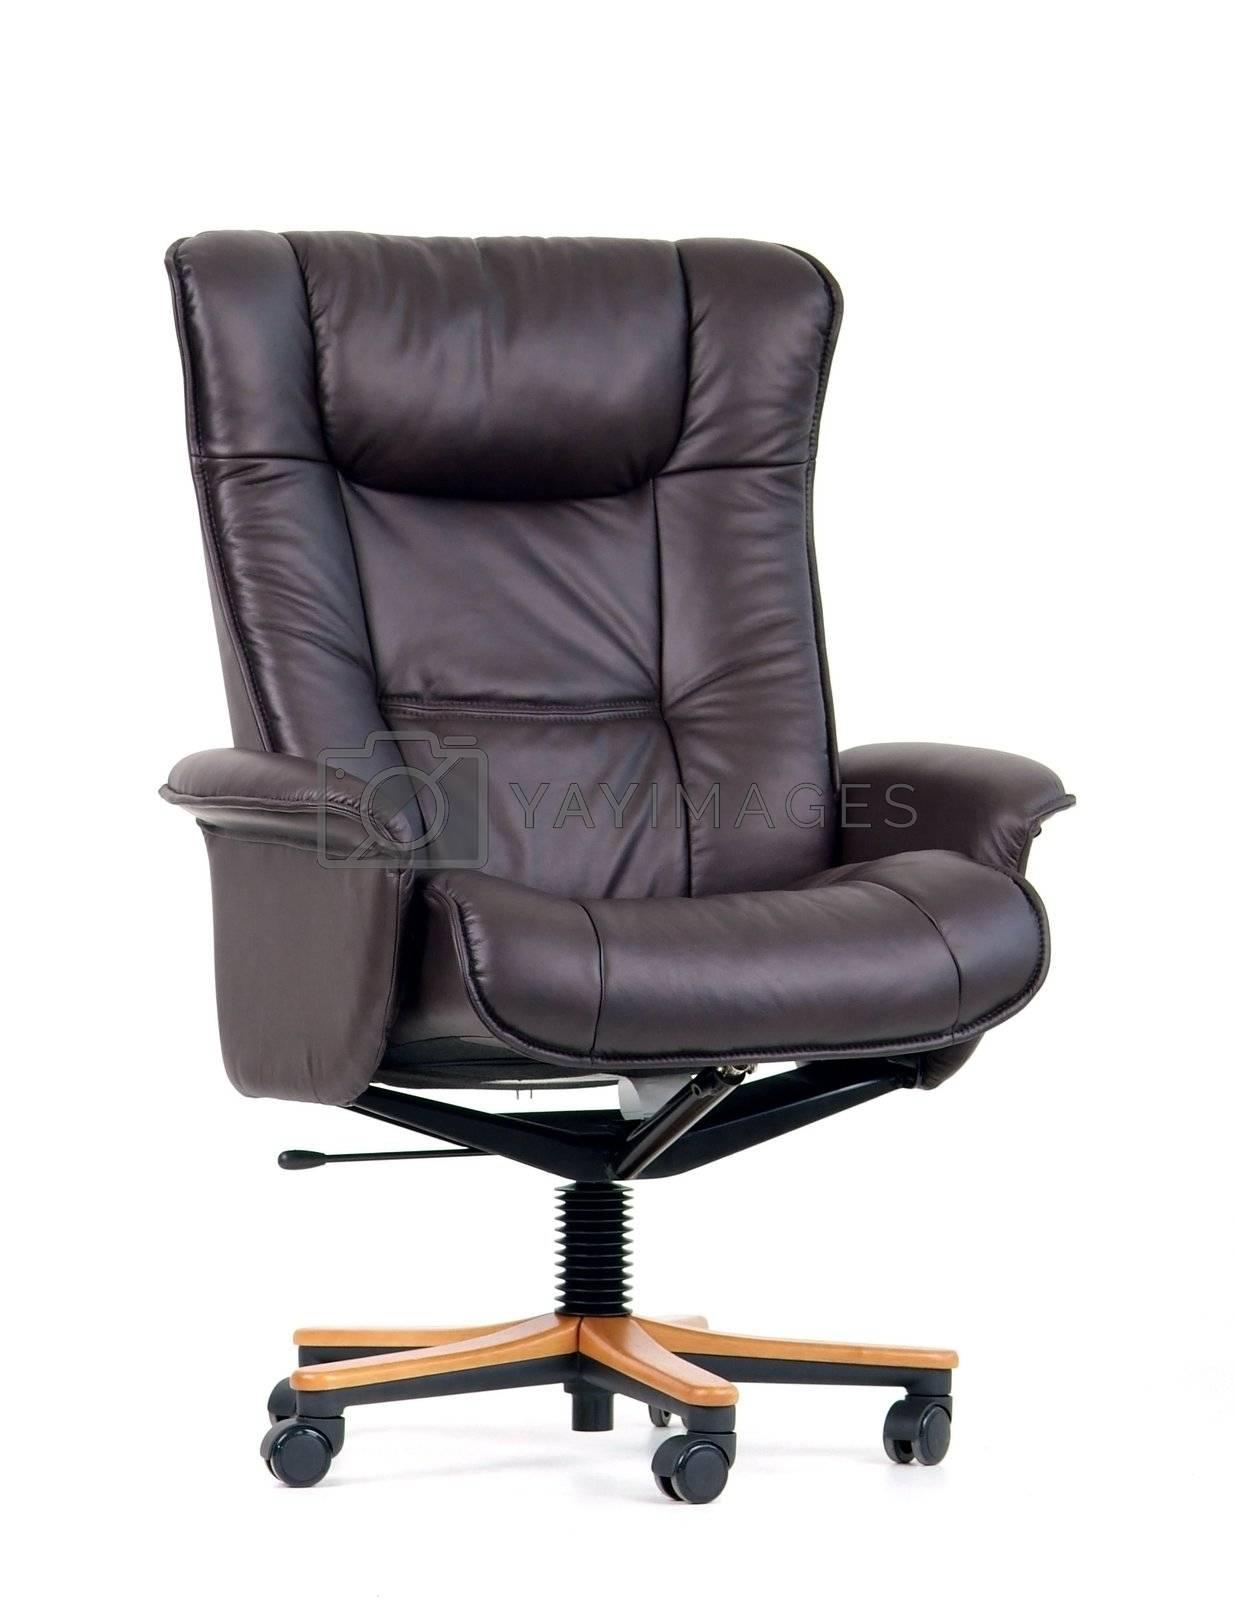 Black luxury office chair by epixx